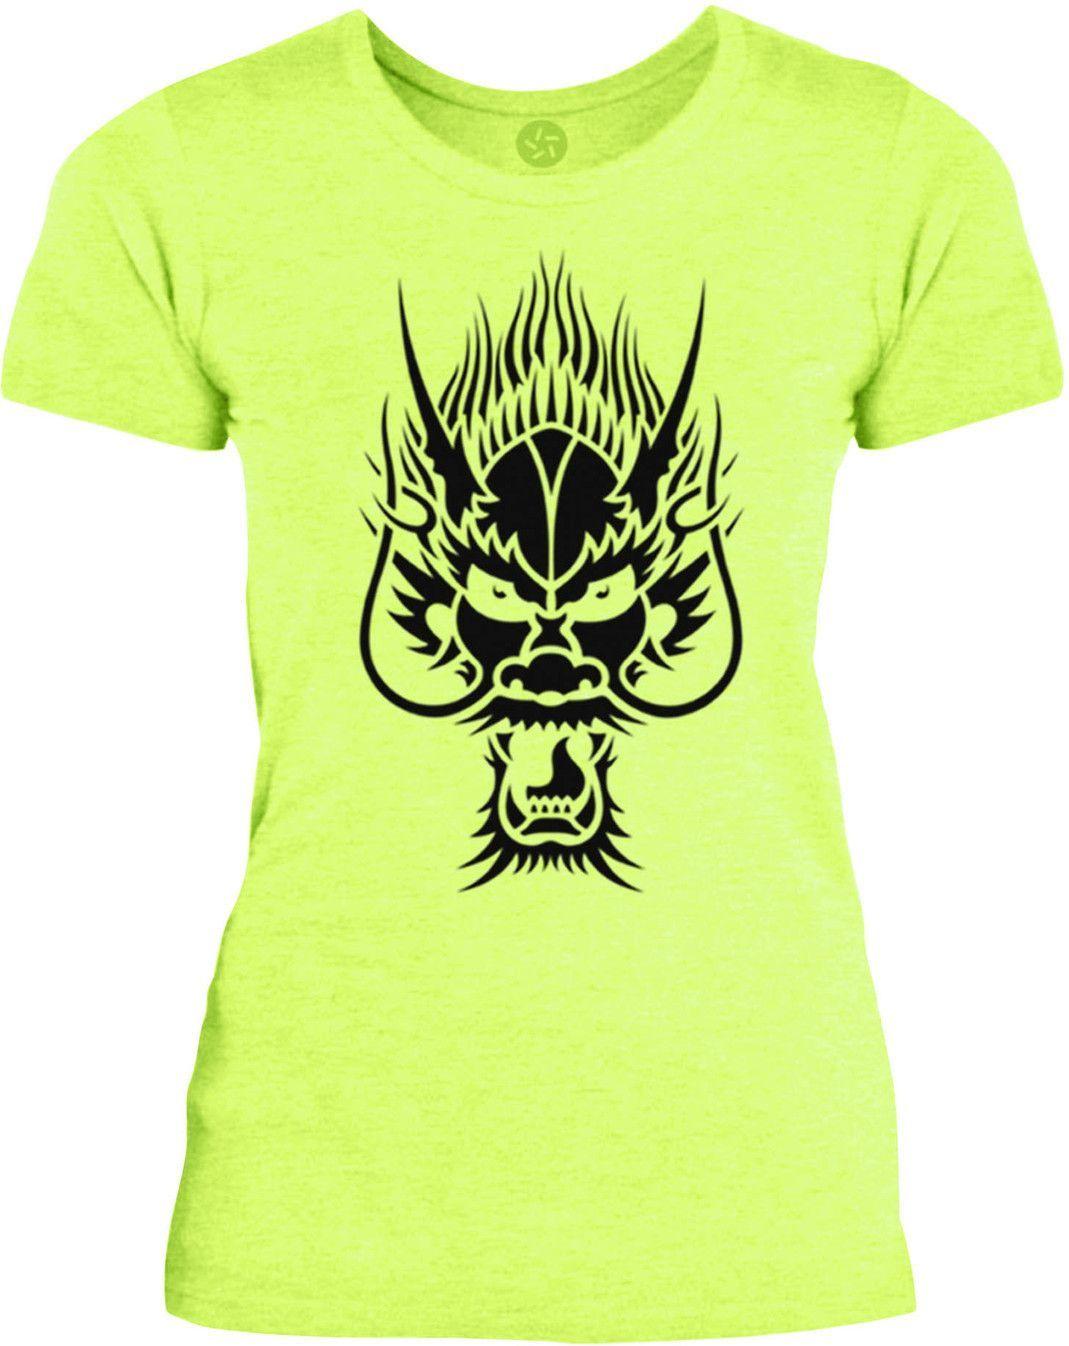 Big Texas Dragon Face (Black) Womens Fine Jersey T-Shirt